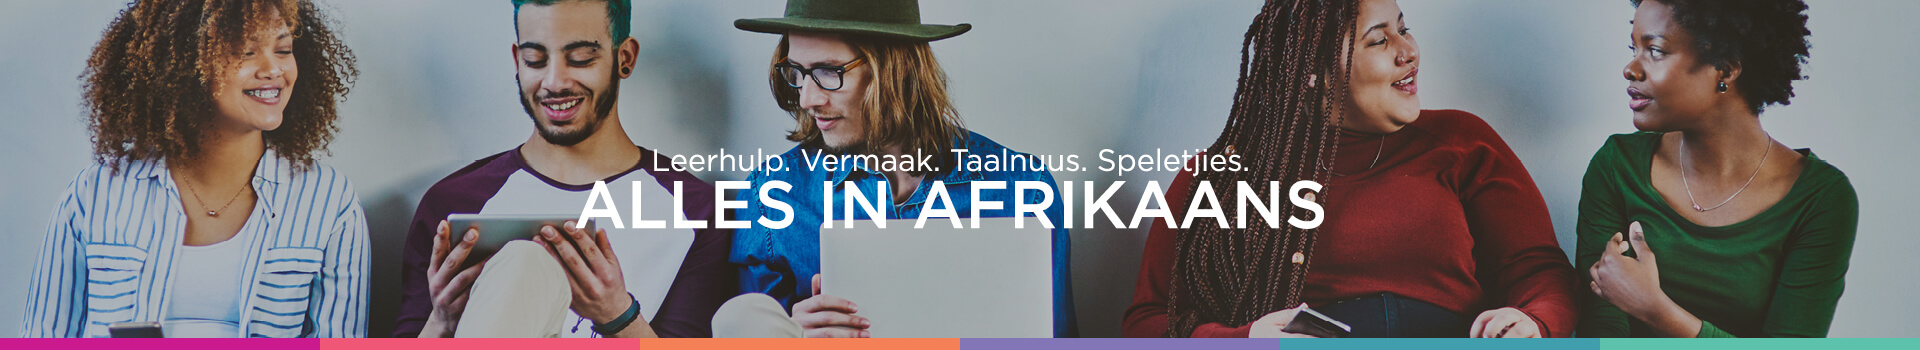 Afrikaans.com Home